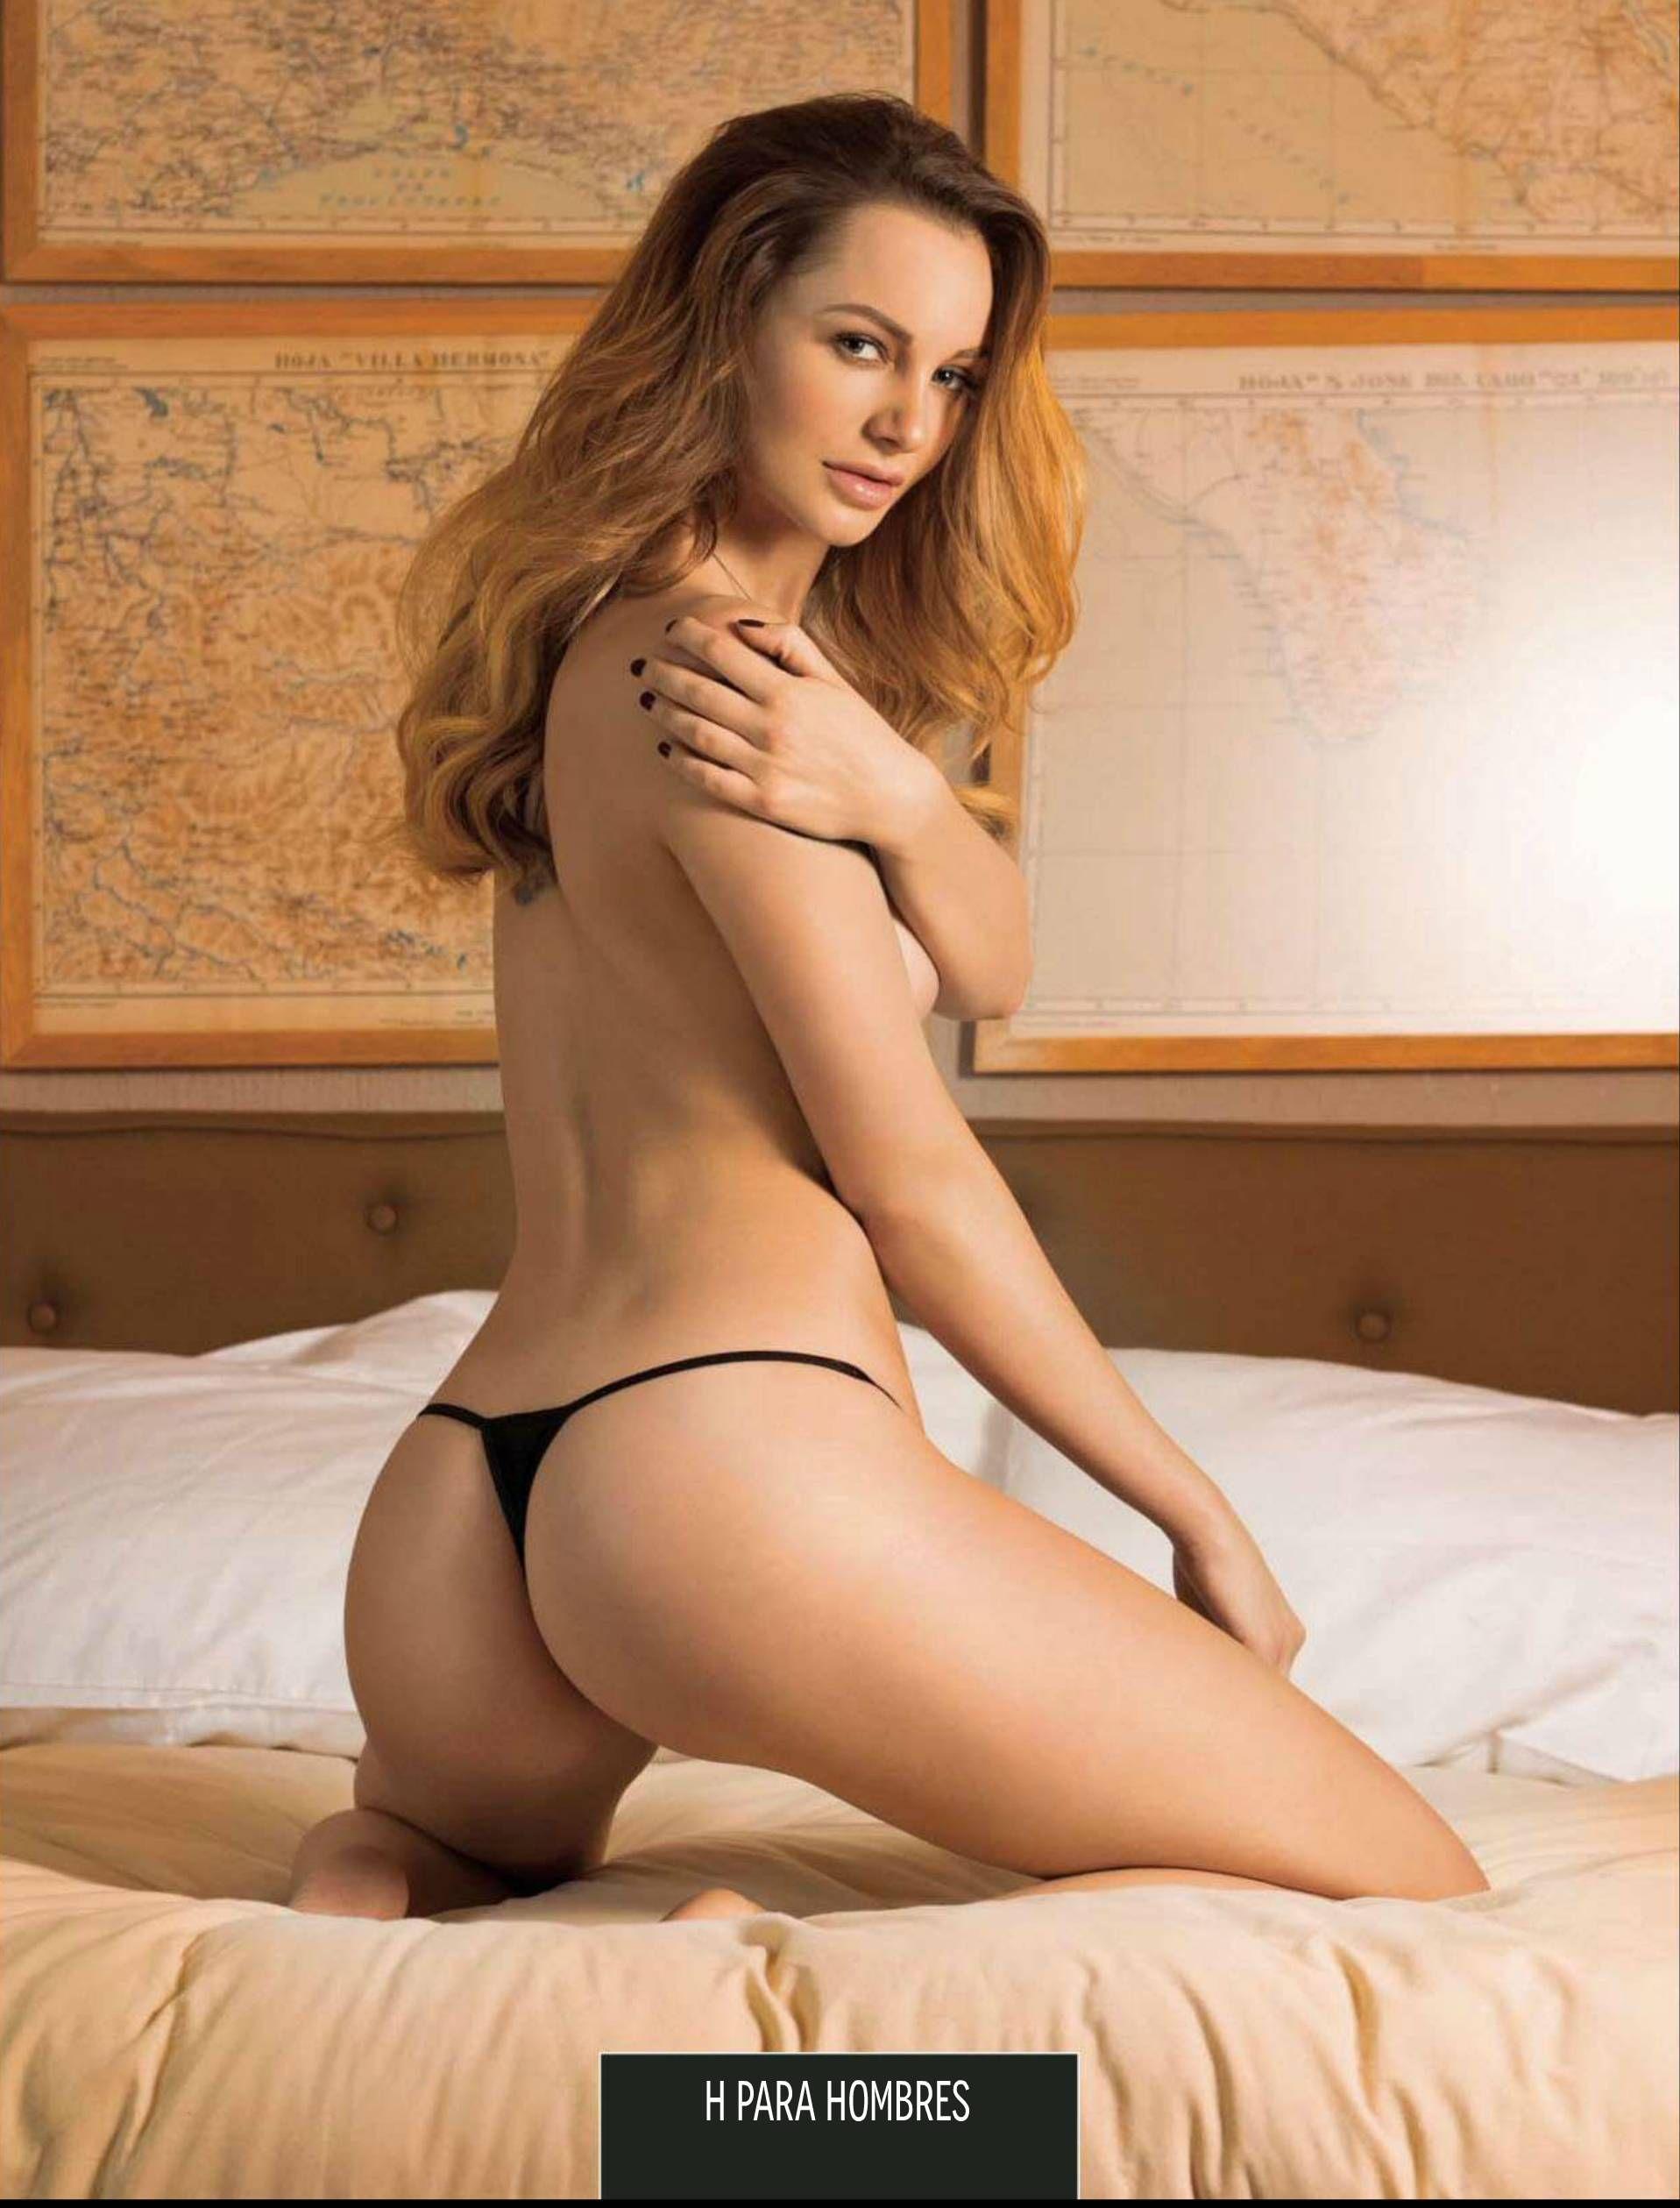 Topless Ewa Kopczynska